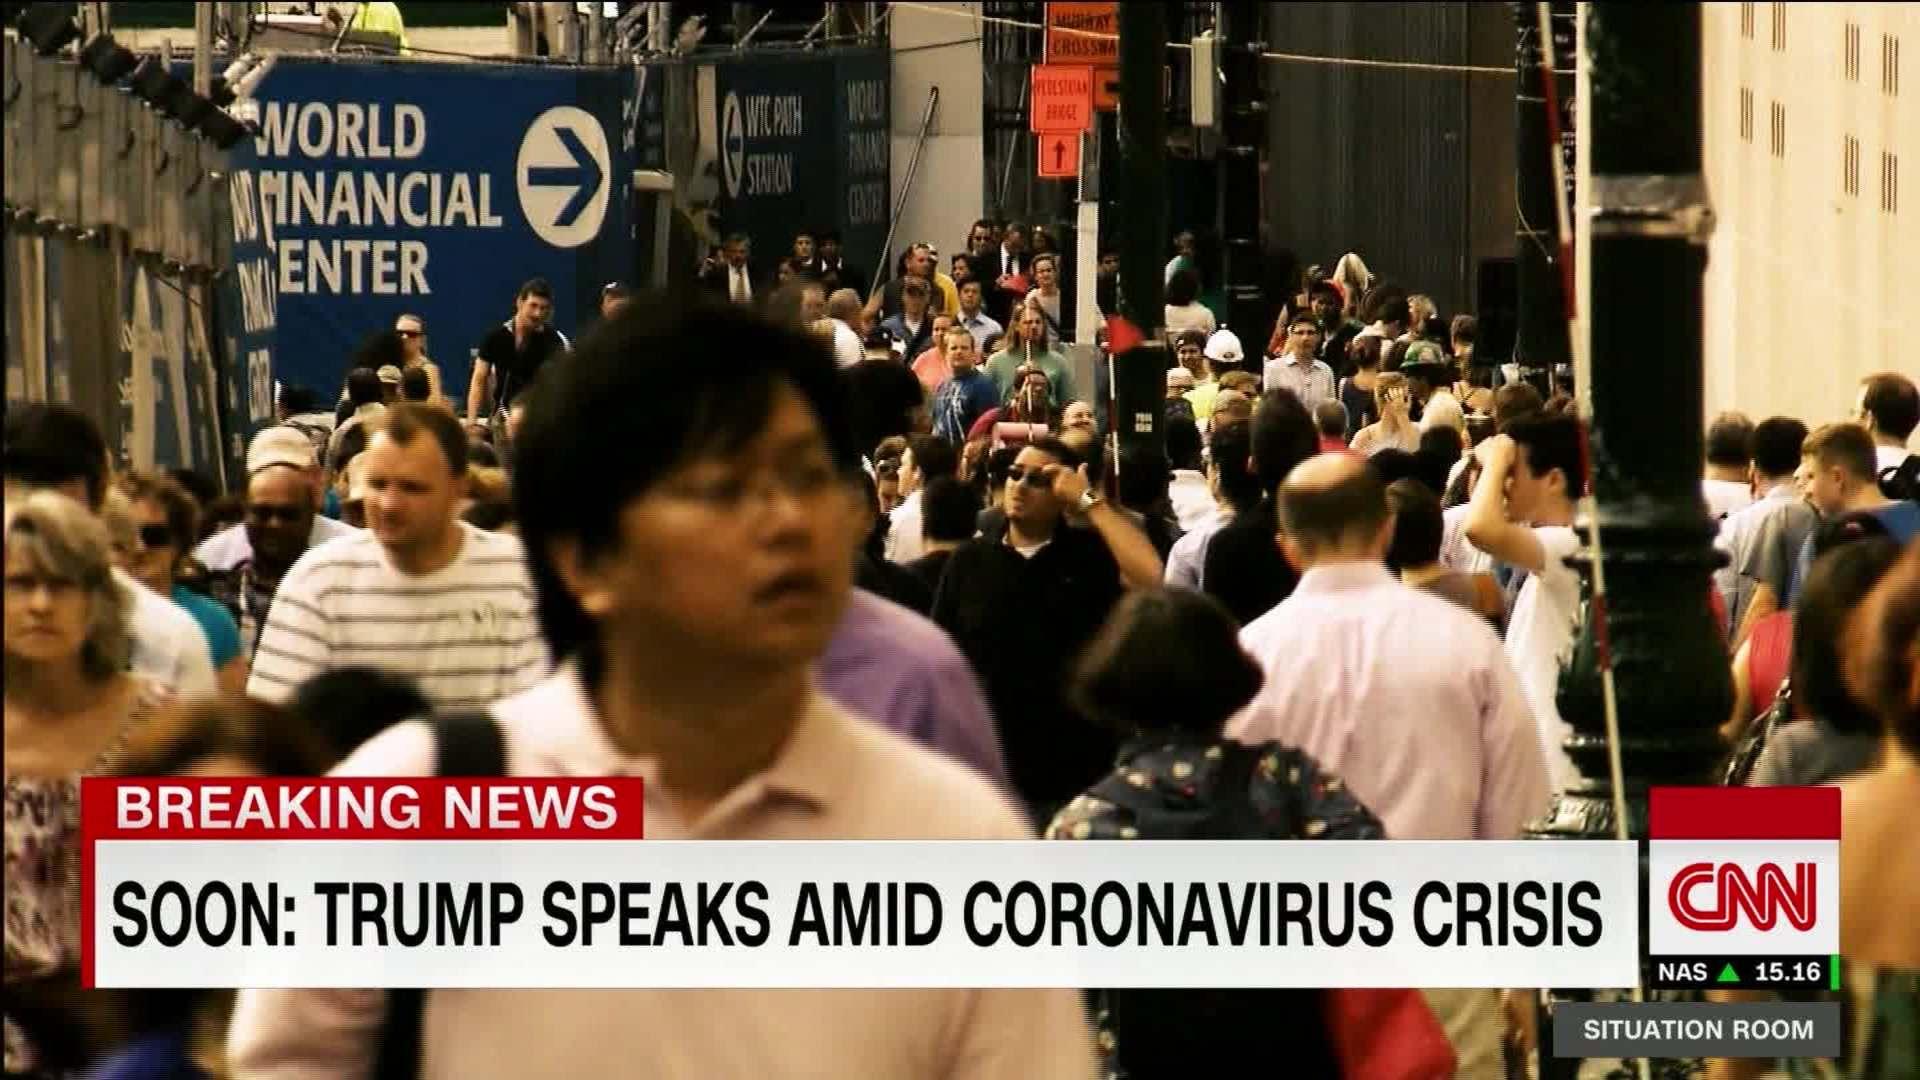 How To Avoid Coronavirus Cnn Video